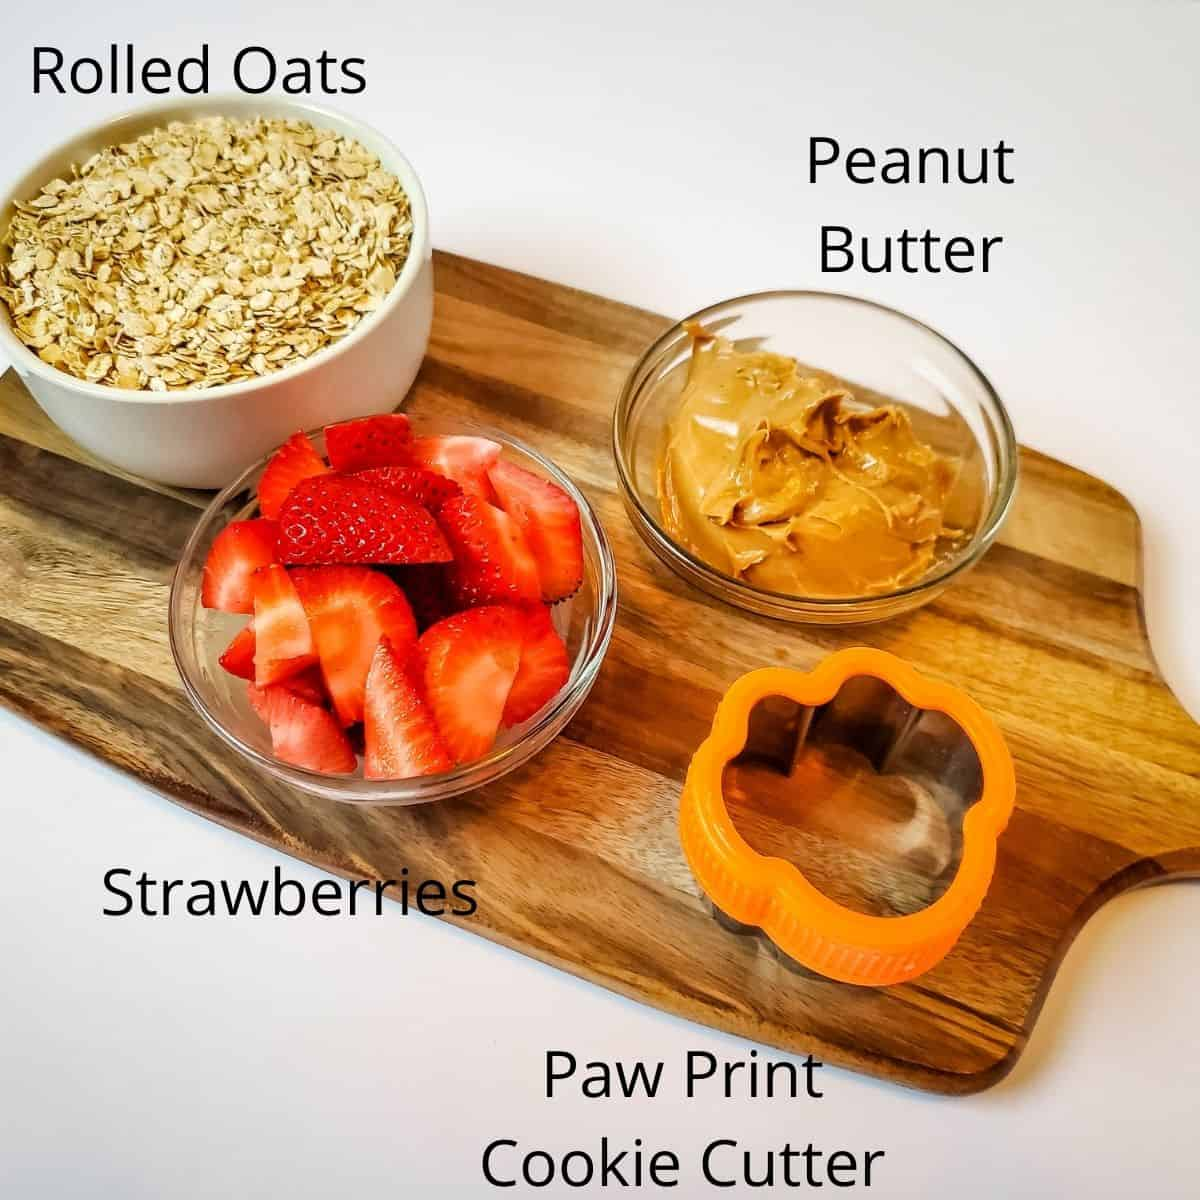 Paw print ingredients